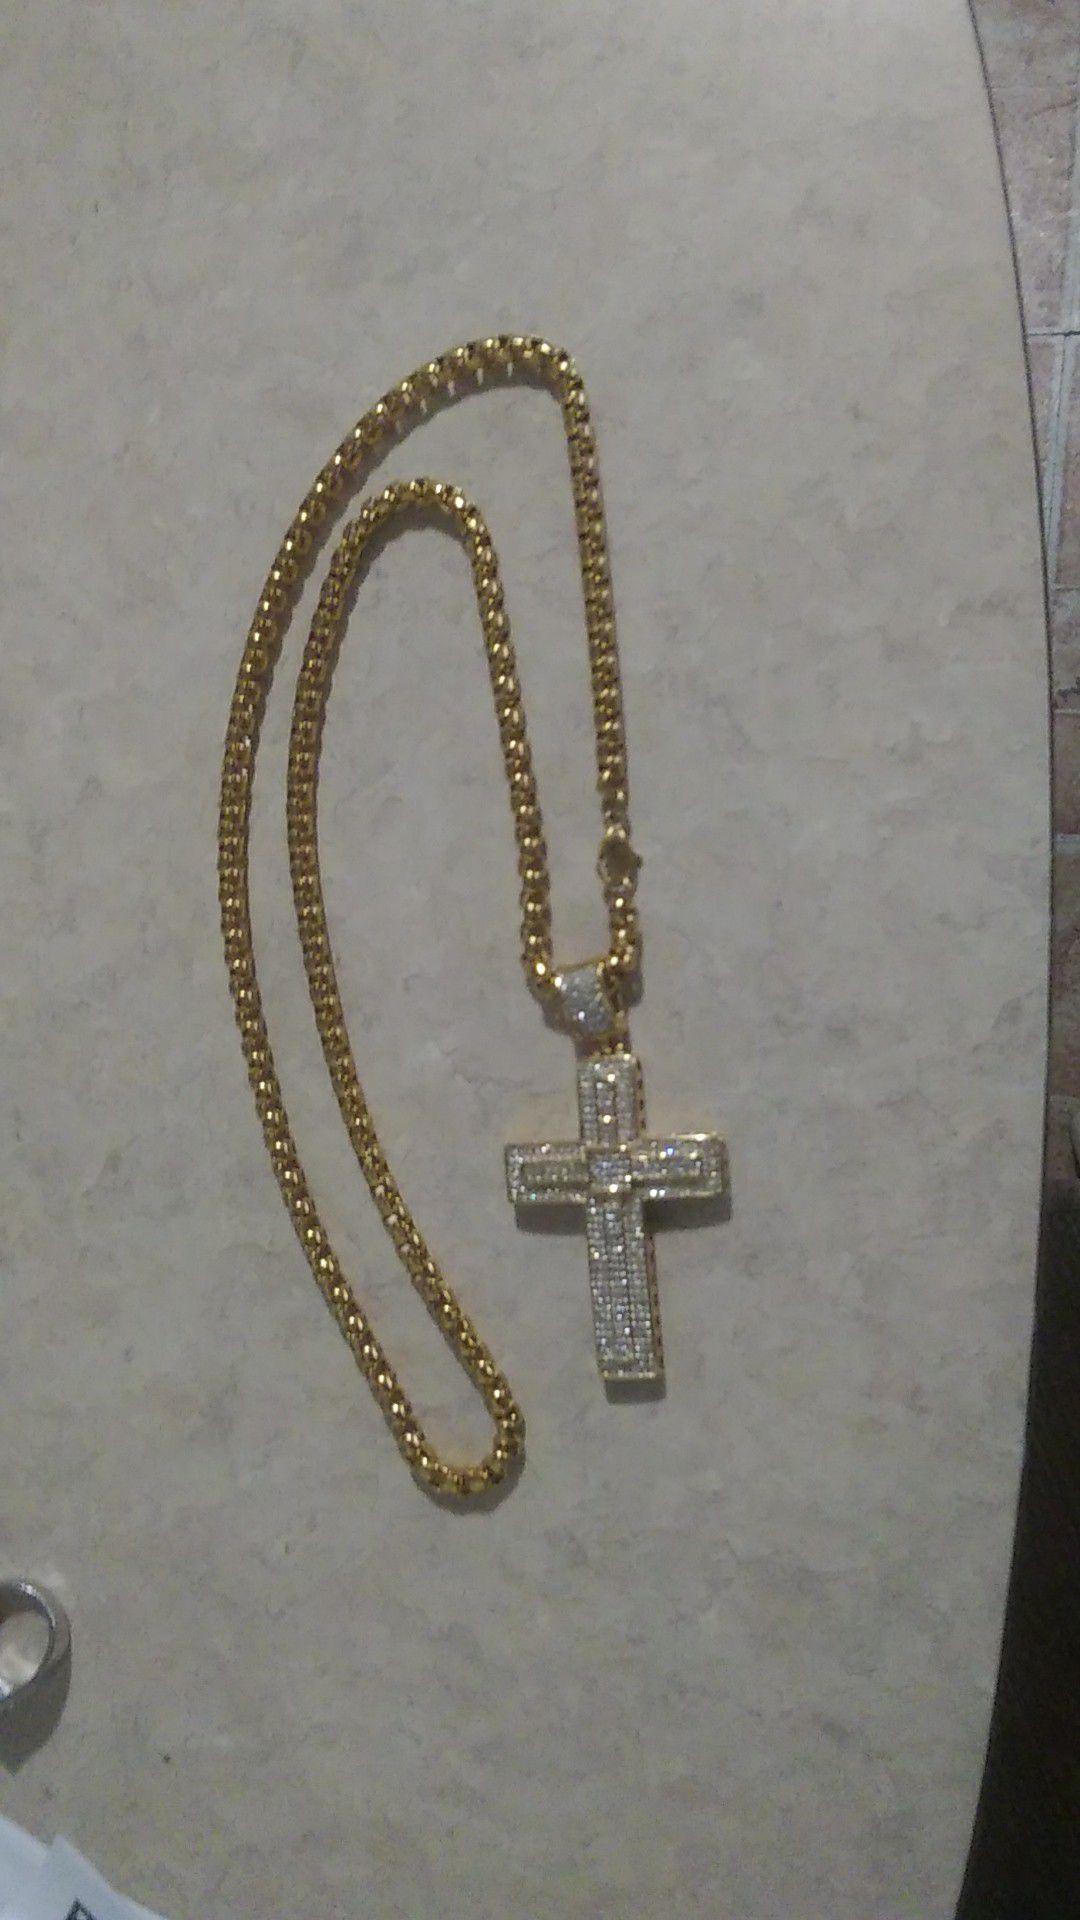 Charm and chain